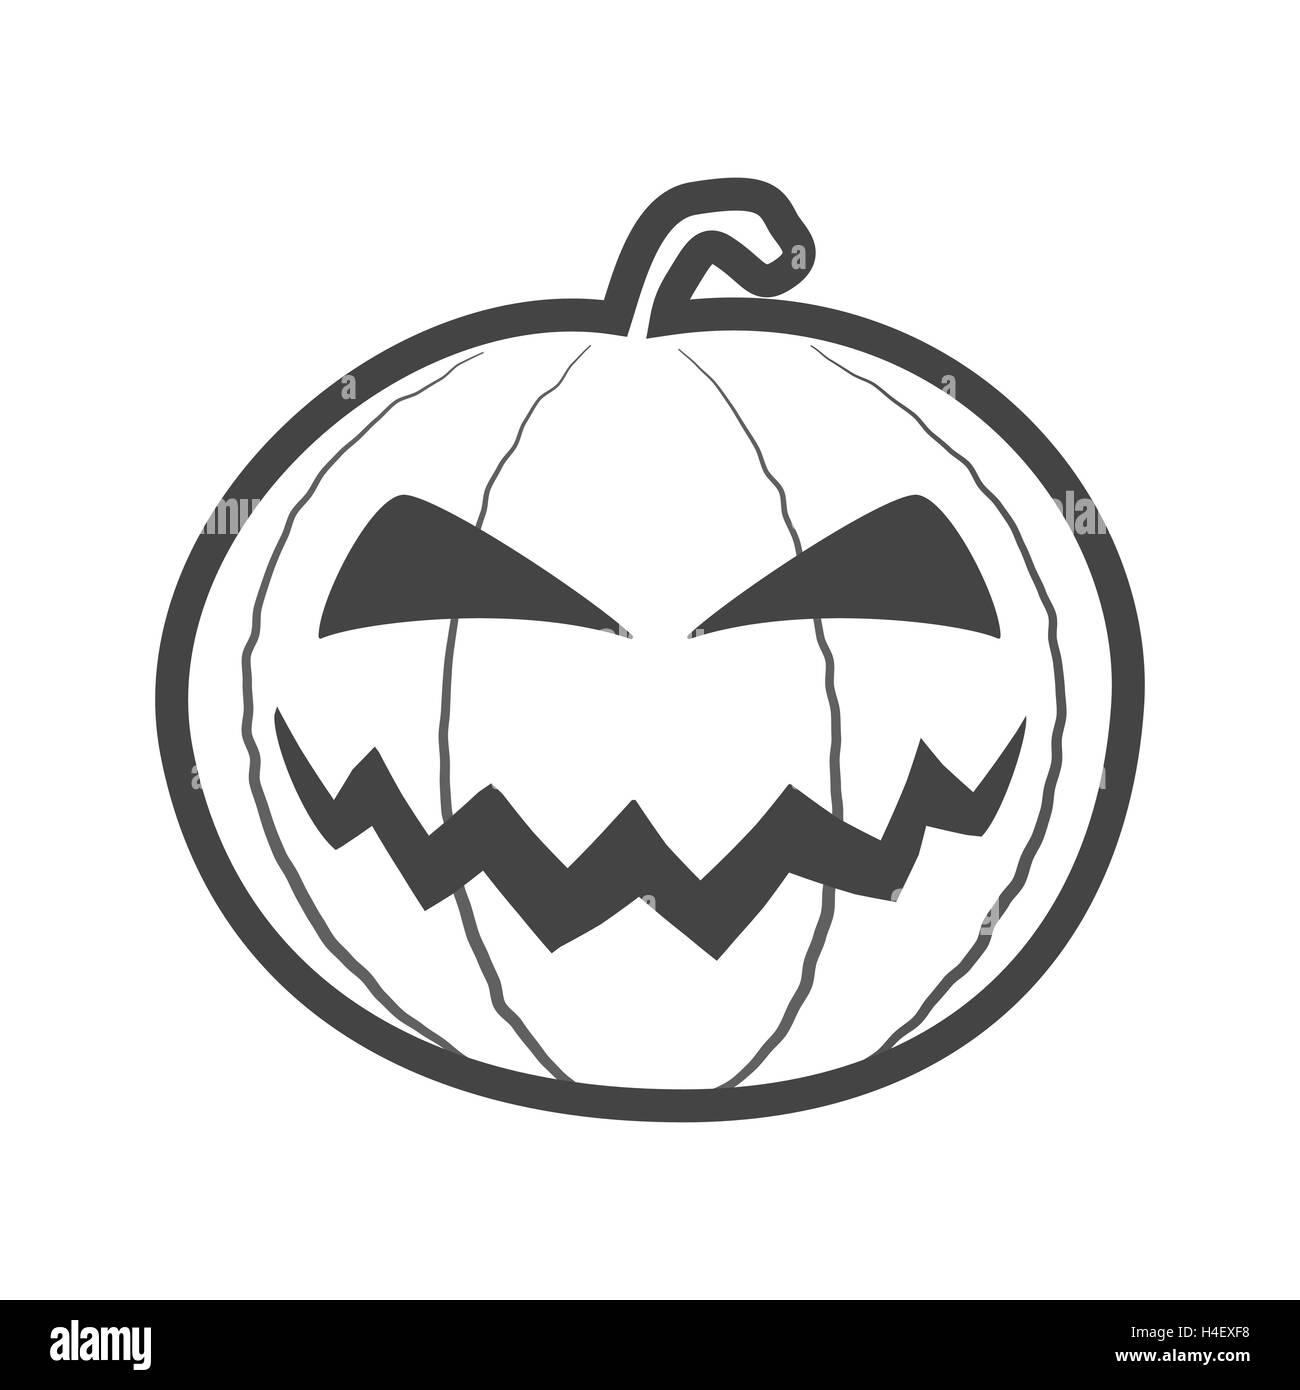 halloween pumpkin outline thin icon - Halloween Pumpkin Outline